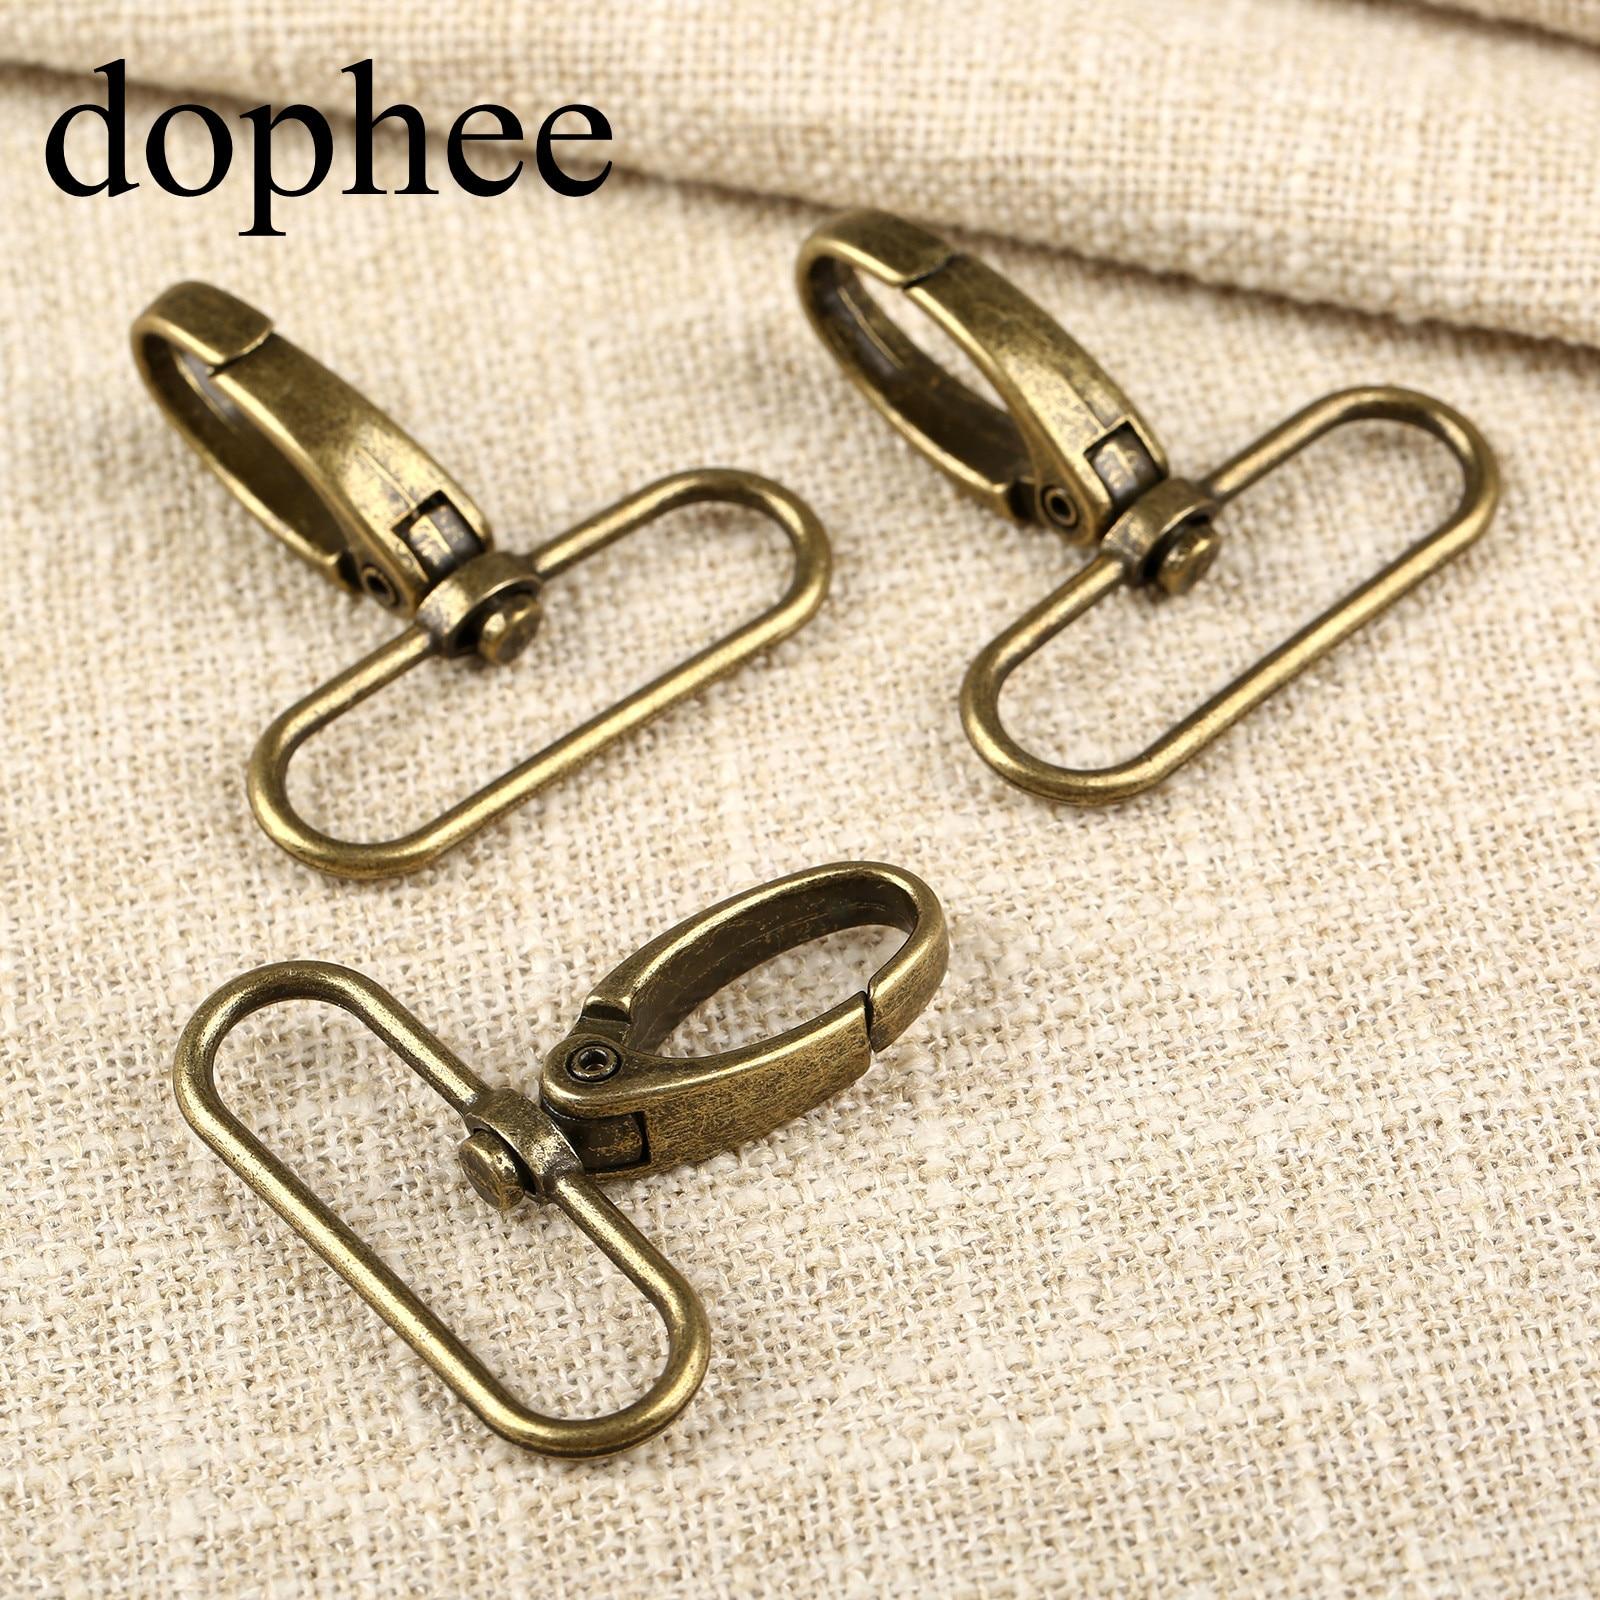 dophee 20pcs/lot Metal Luggage bag Dog buckle Snap hook Bag hanger Lobster Clasp DIY Sewing handmade Key chain buttons LW664